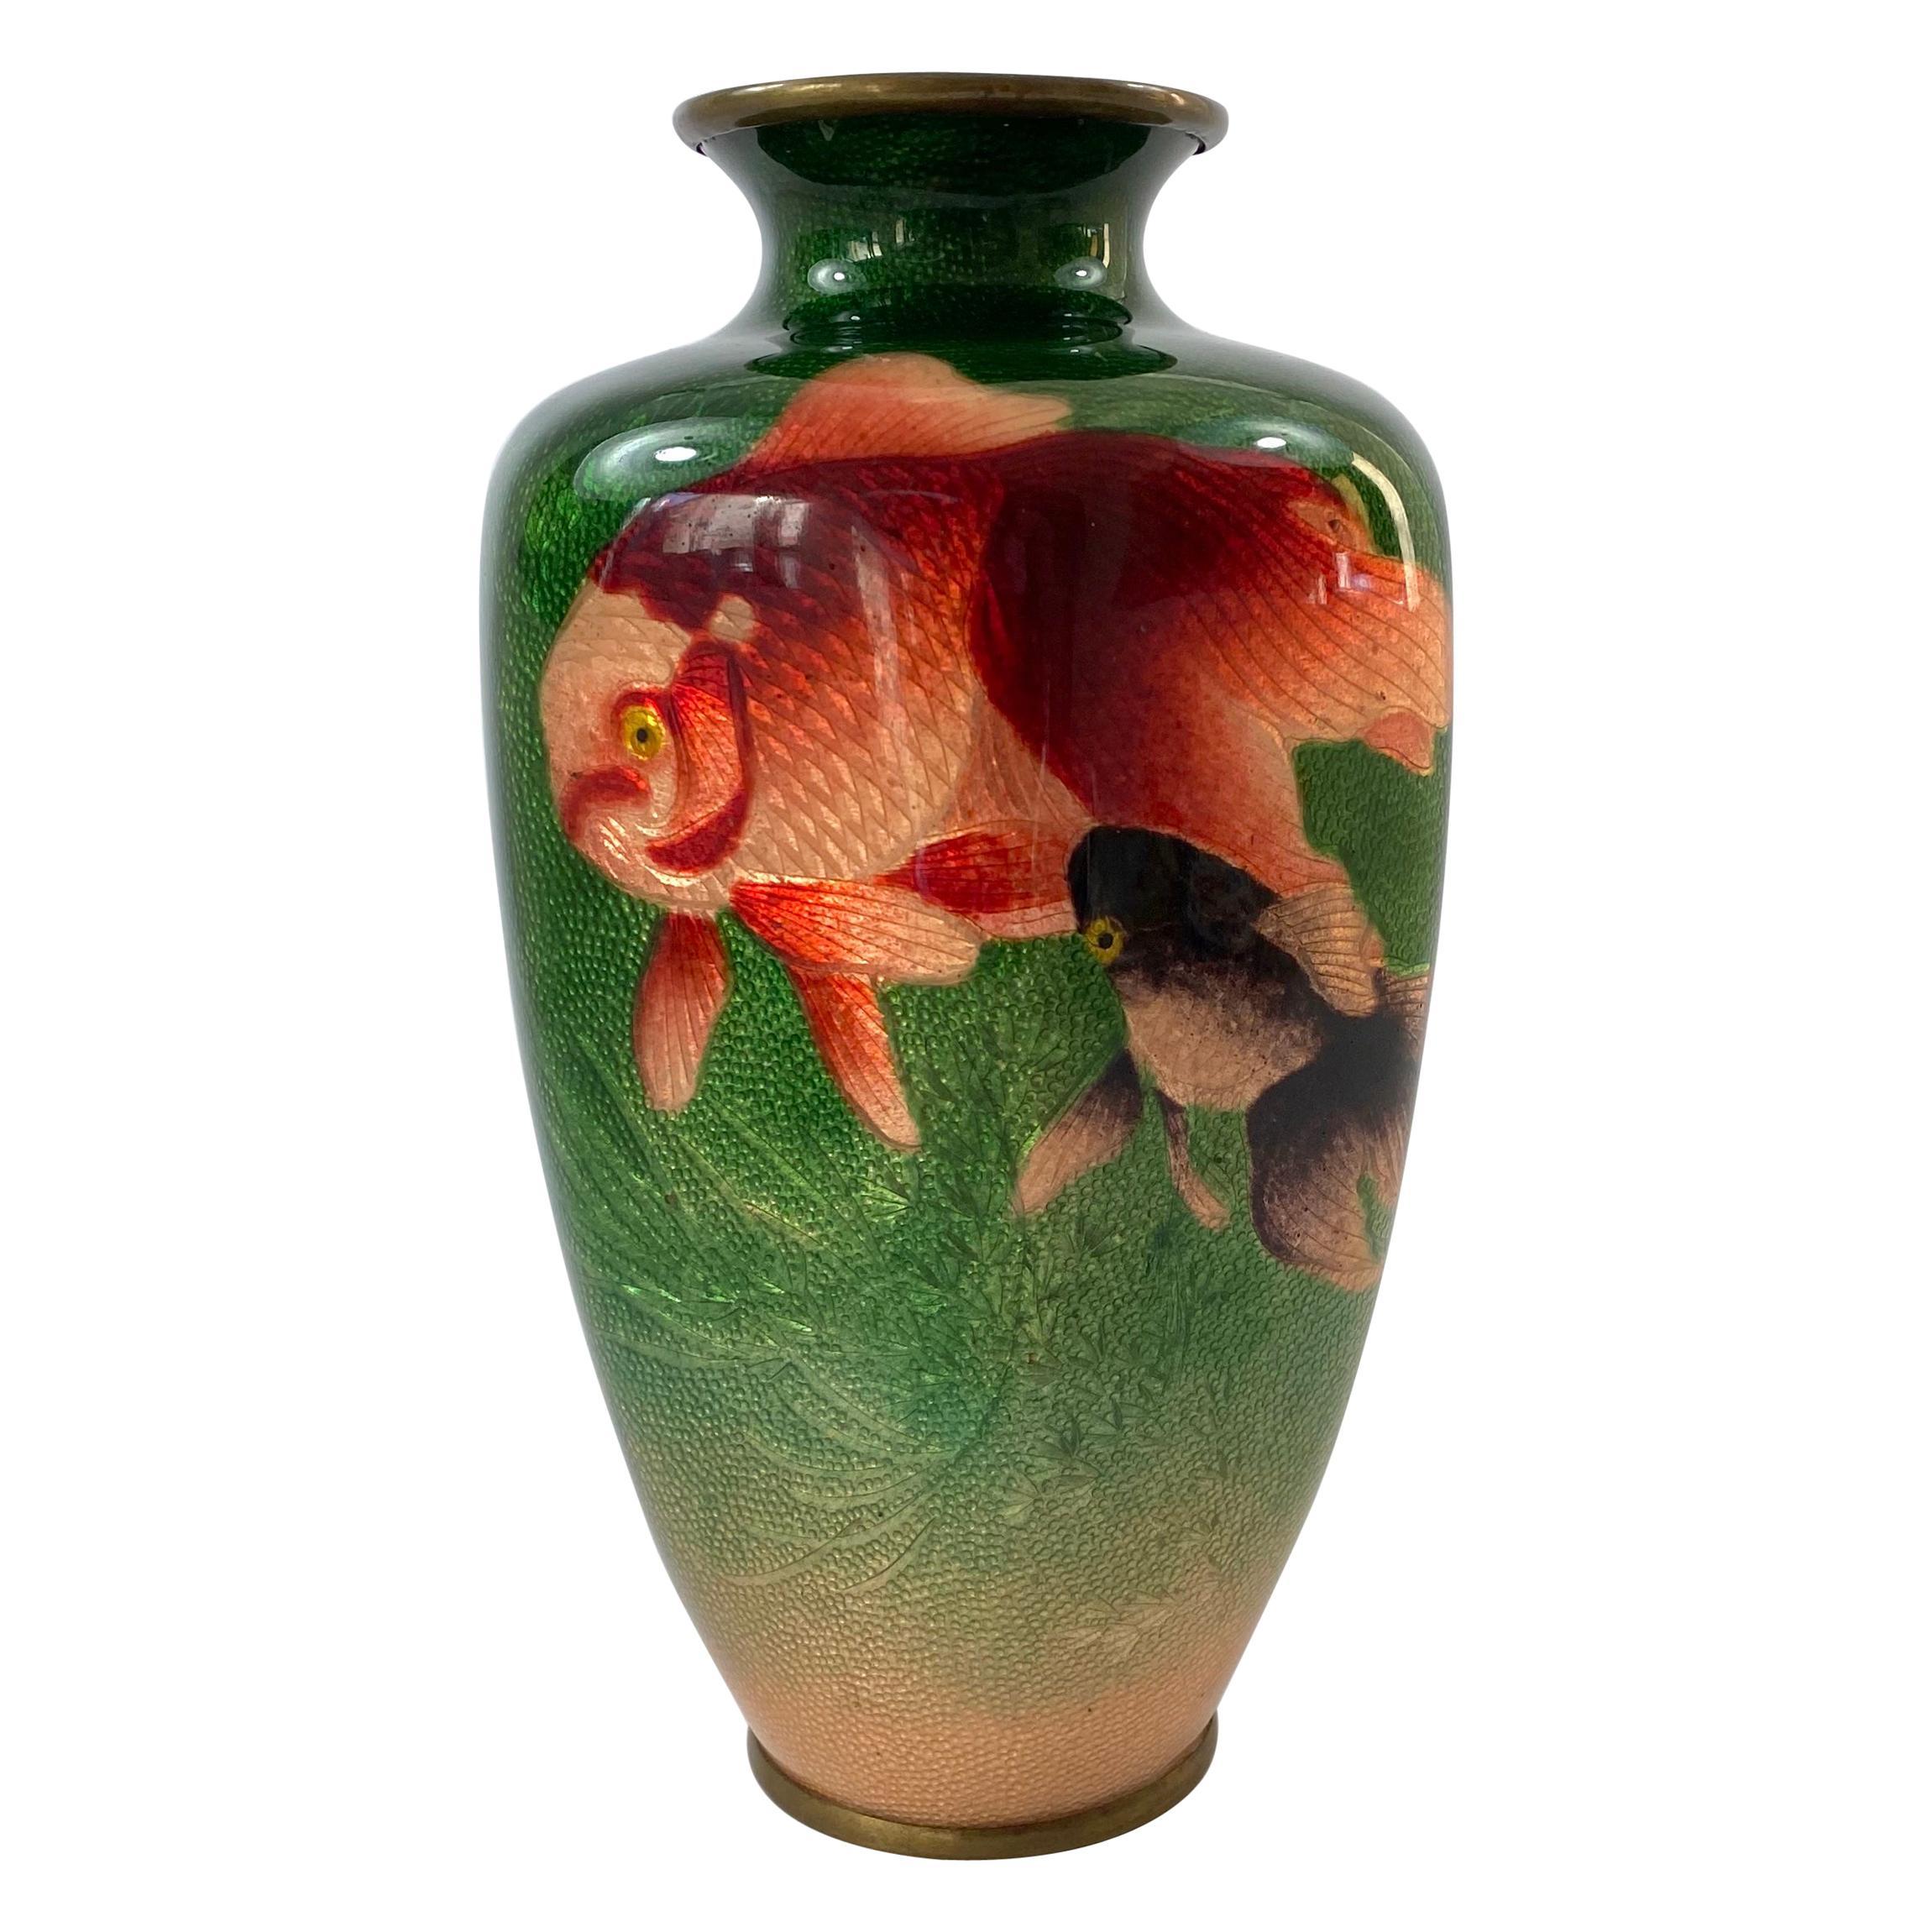 Japanese Ginbari Cloisonne Vase, Ota Toshiro, Meiji Period